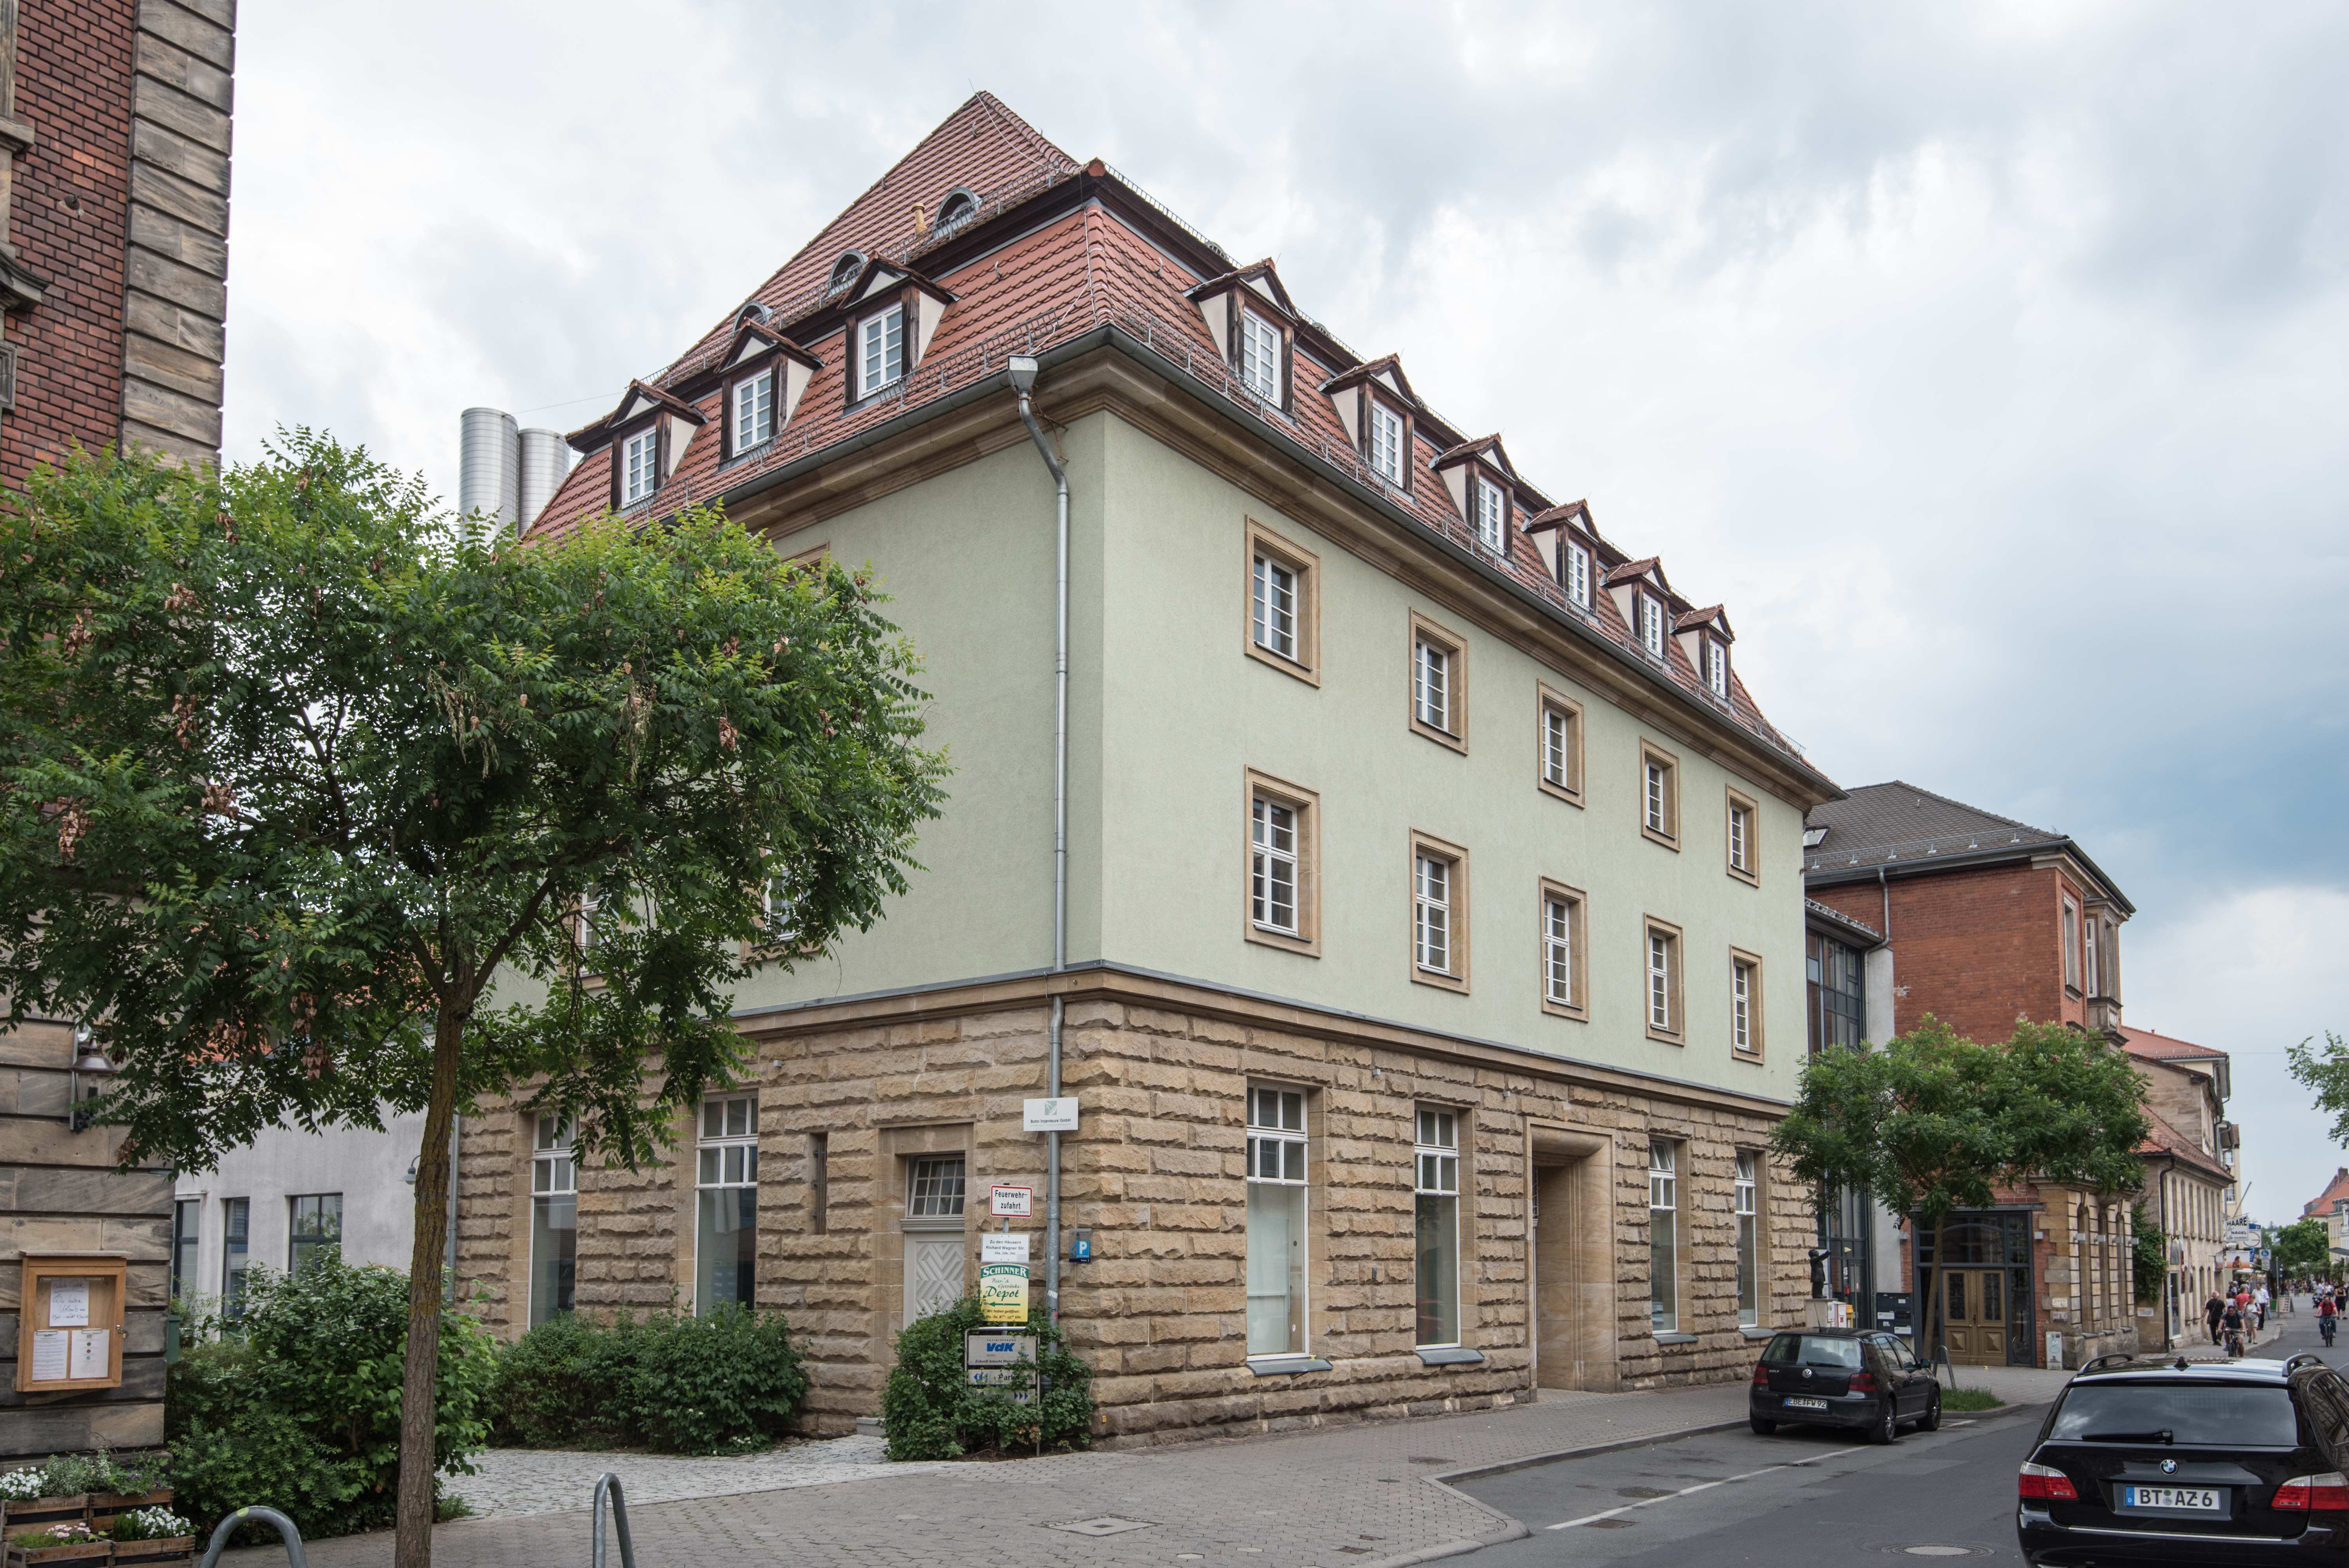 Dateibayreuth Richard Wagner Straße 36 20170603 001jpg Wikipedia